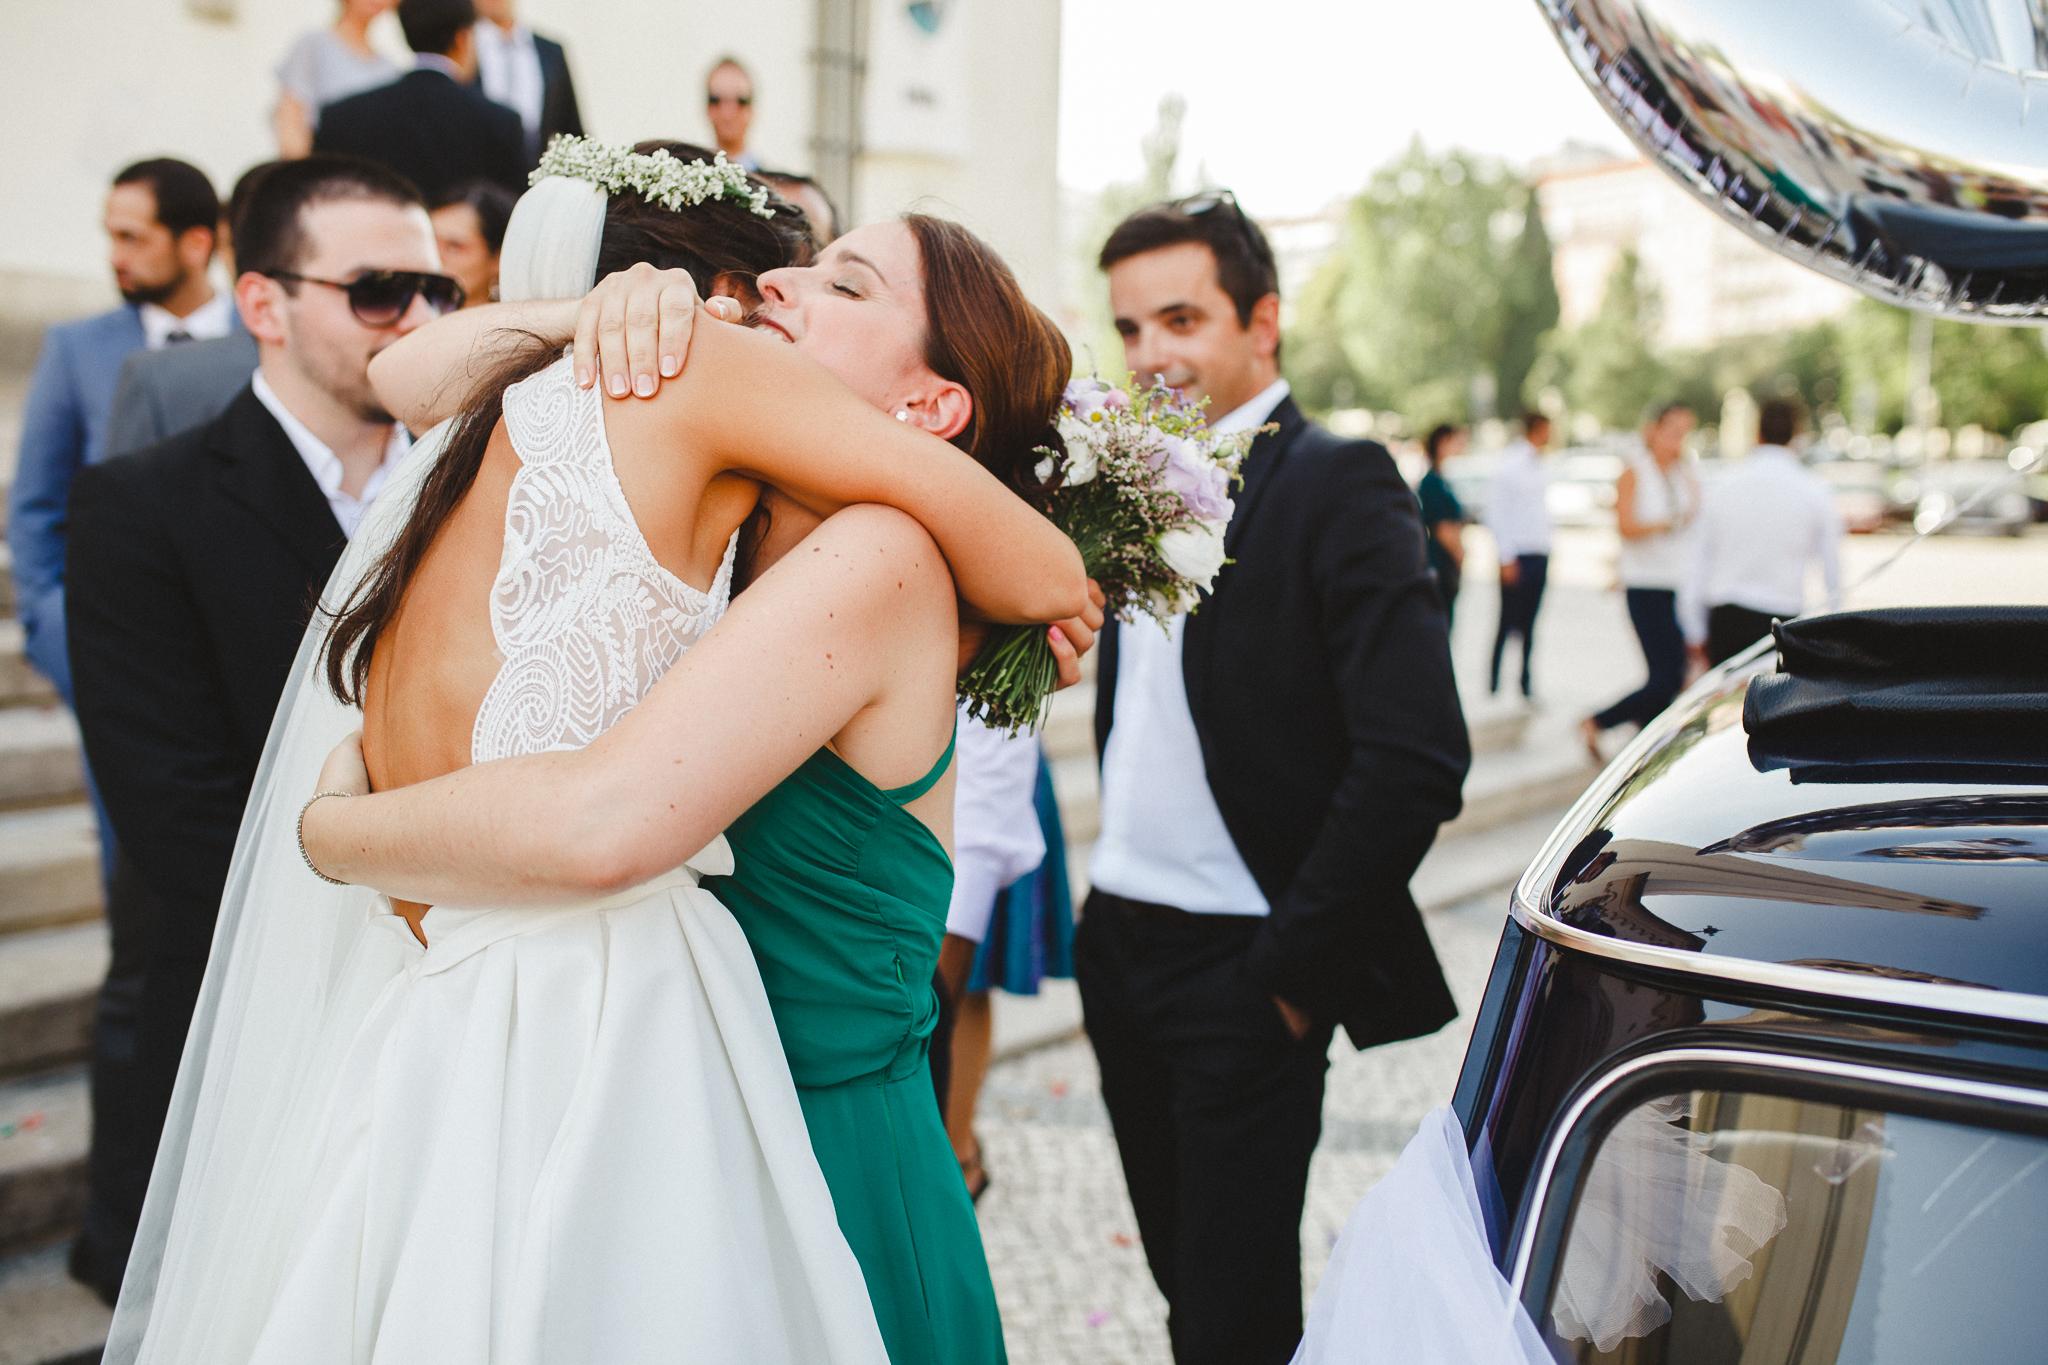 Fotografia de Casamento Lisboa, Casamento Quinta dos Machados, Wedding Photography Portugal by Hello Twiggs